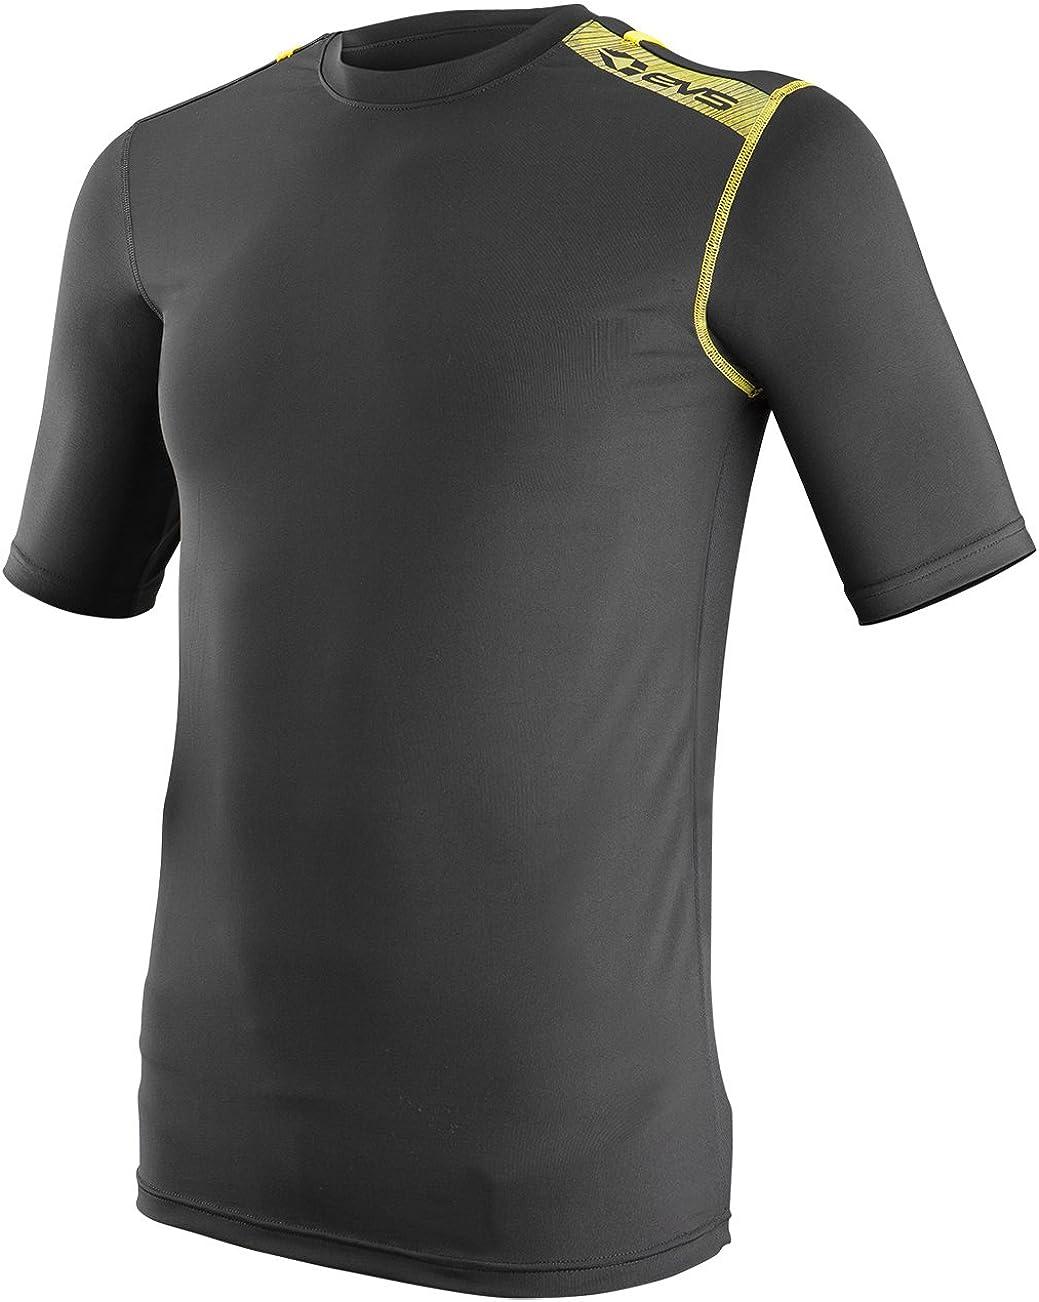 EVS Sports Unisex-Adult 超激安 新作製品 世界最高品質人気 Tug Long Shirt Top Sleeve